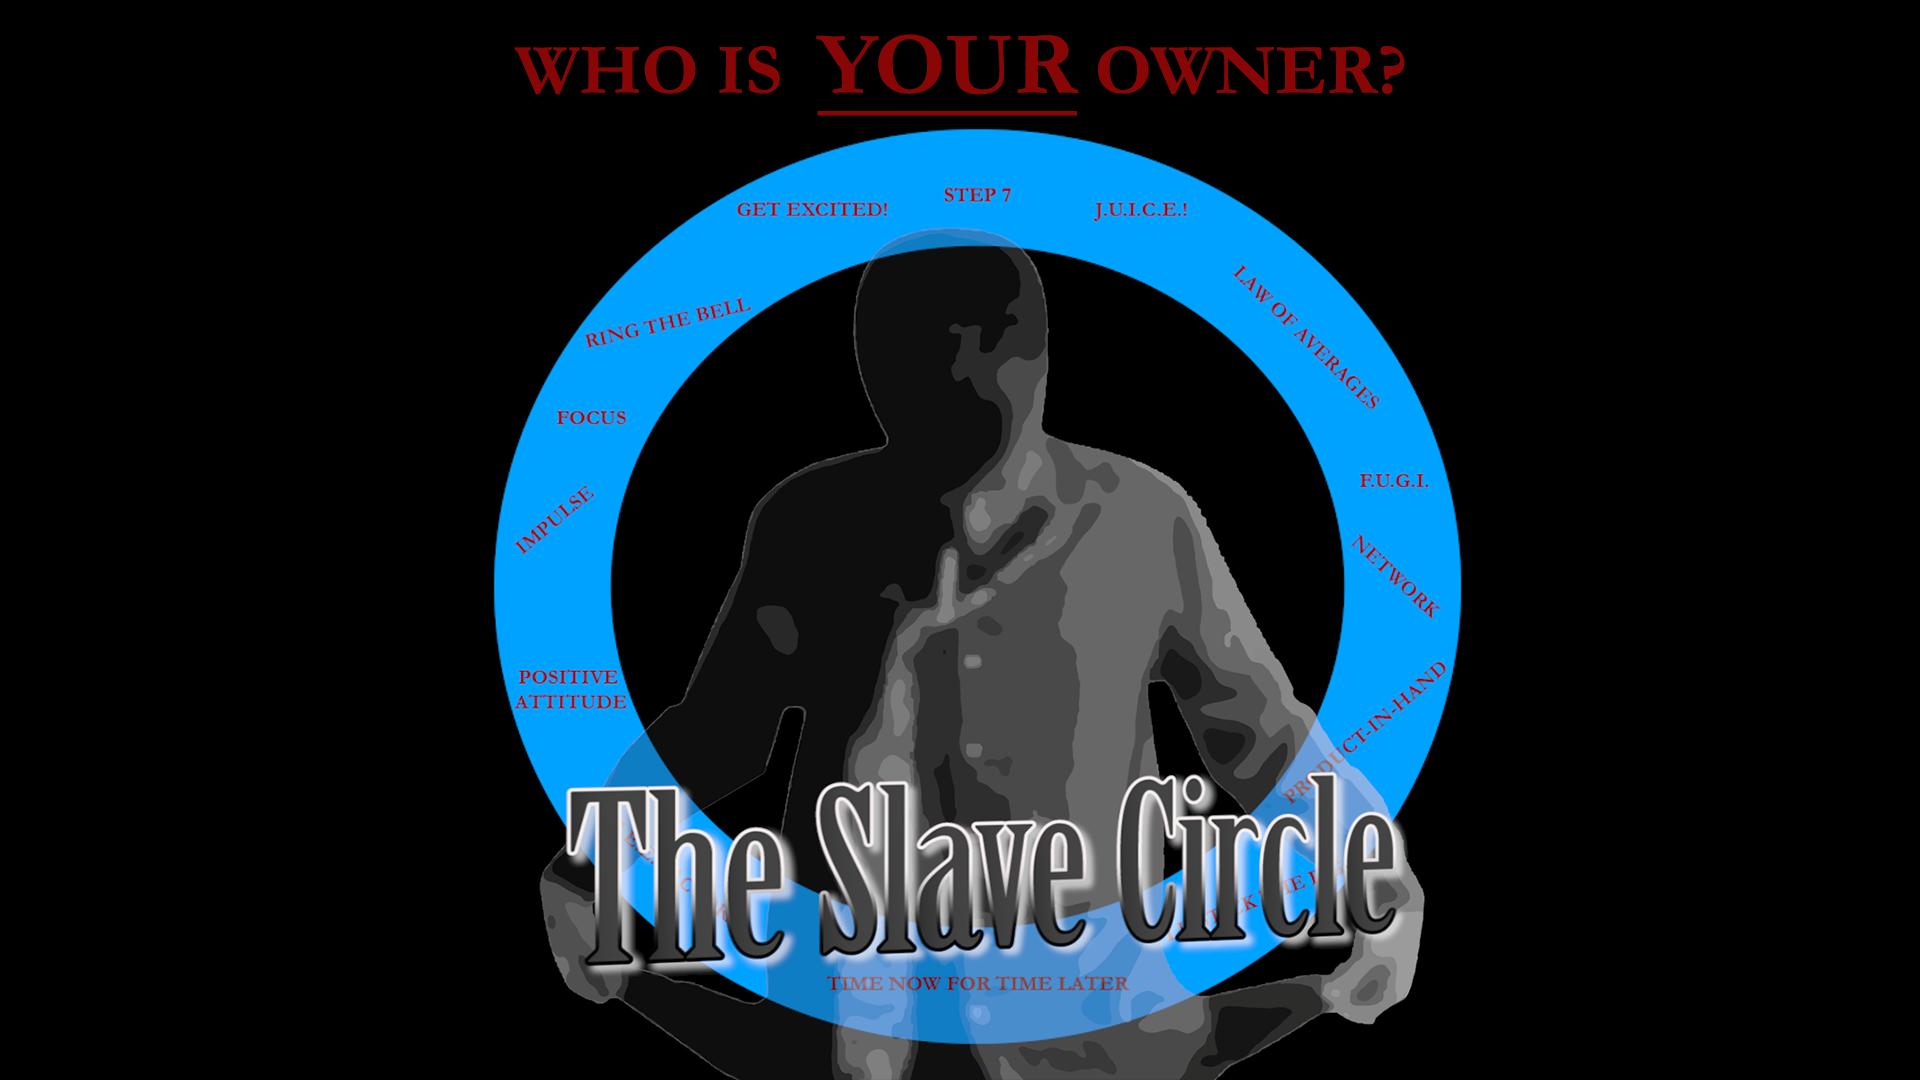 The Slave Circle